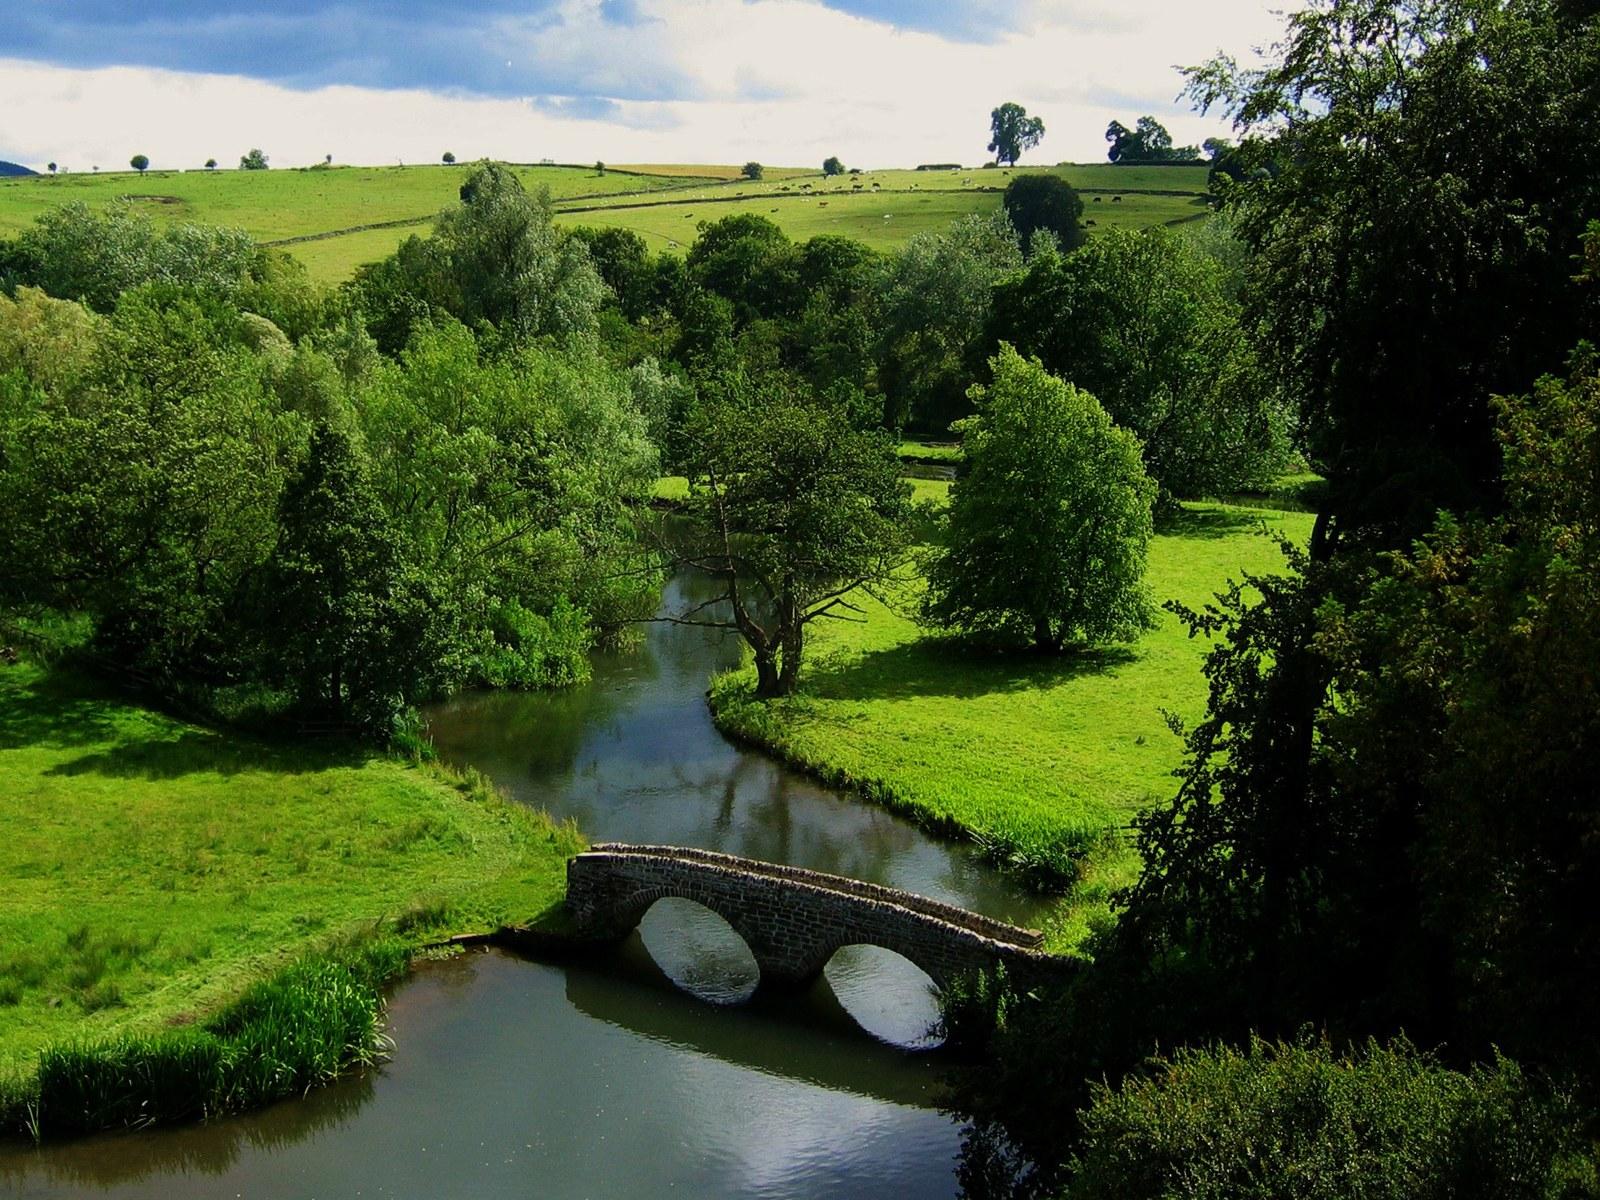 England Countryside   Wallpaper 18152 1600x1200